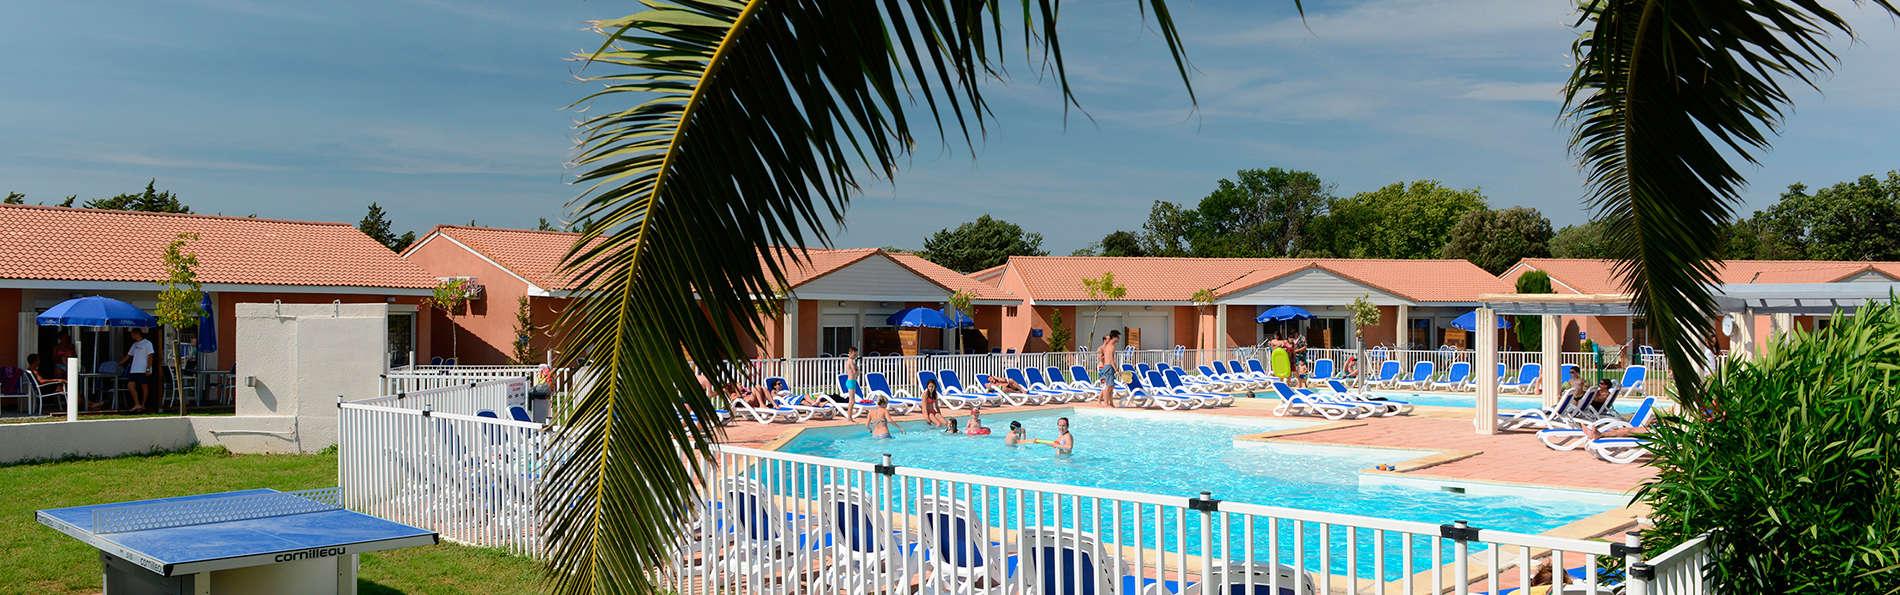 Week end bien tre sall les d 39 aude partir de 121 for Swimming pool technician salary